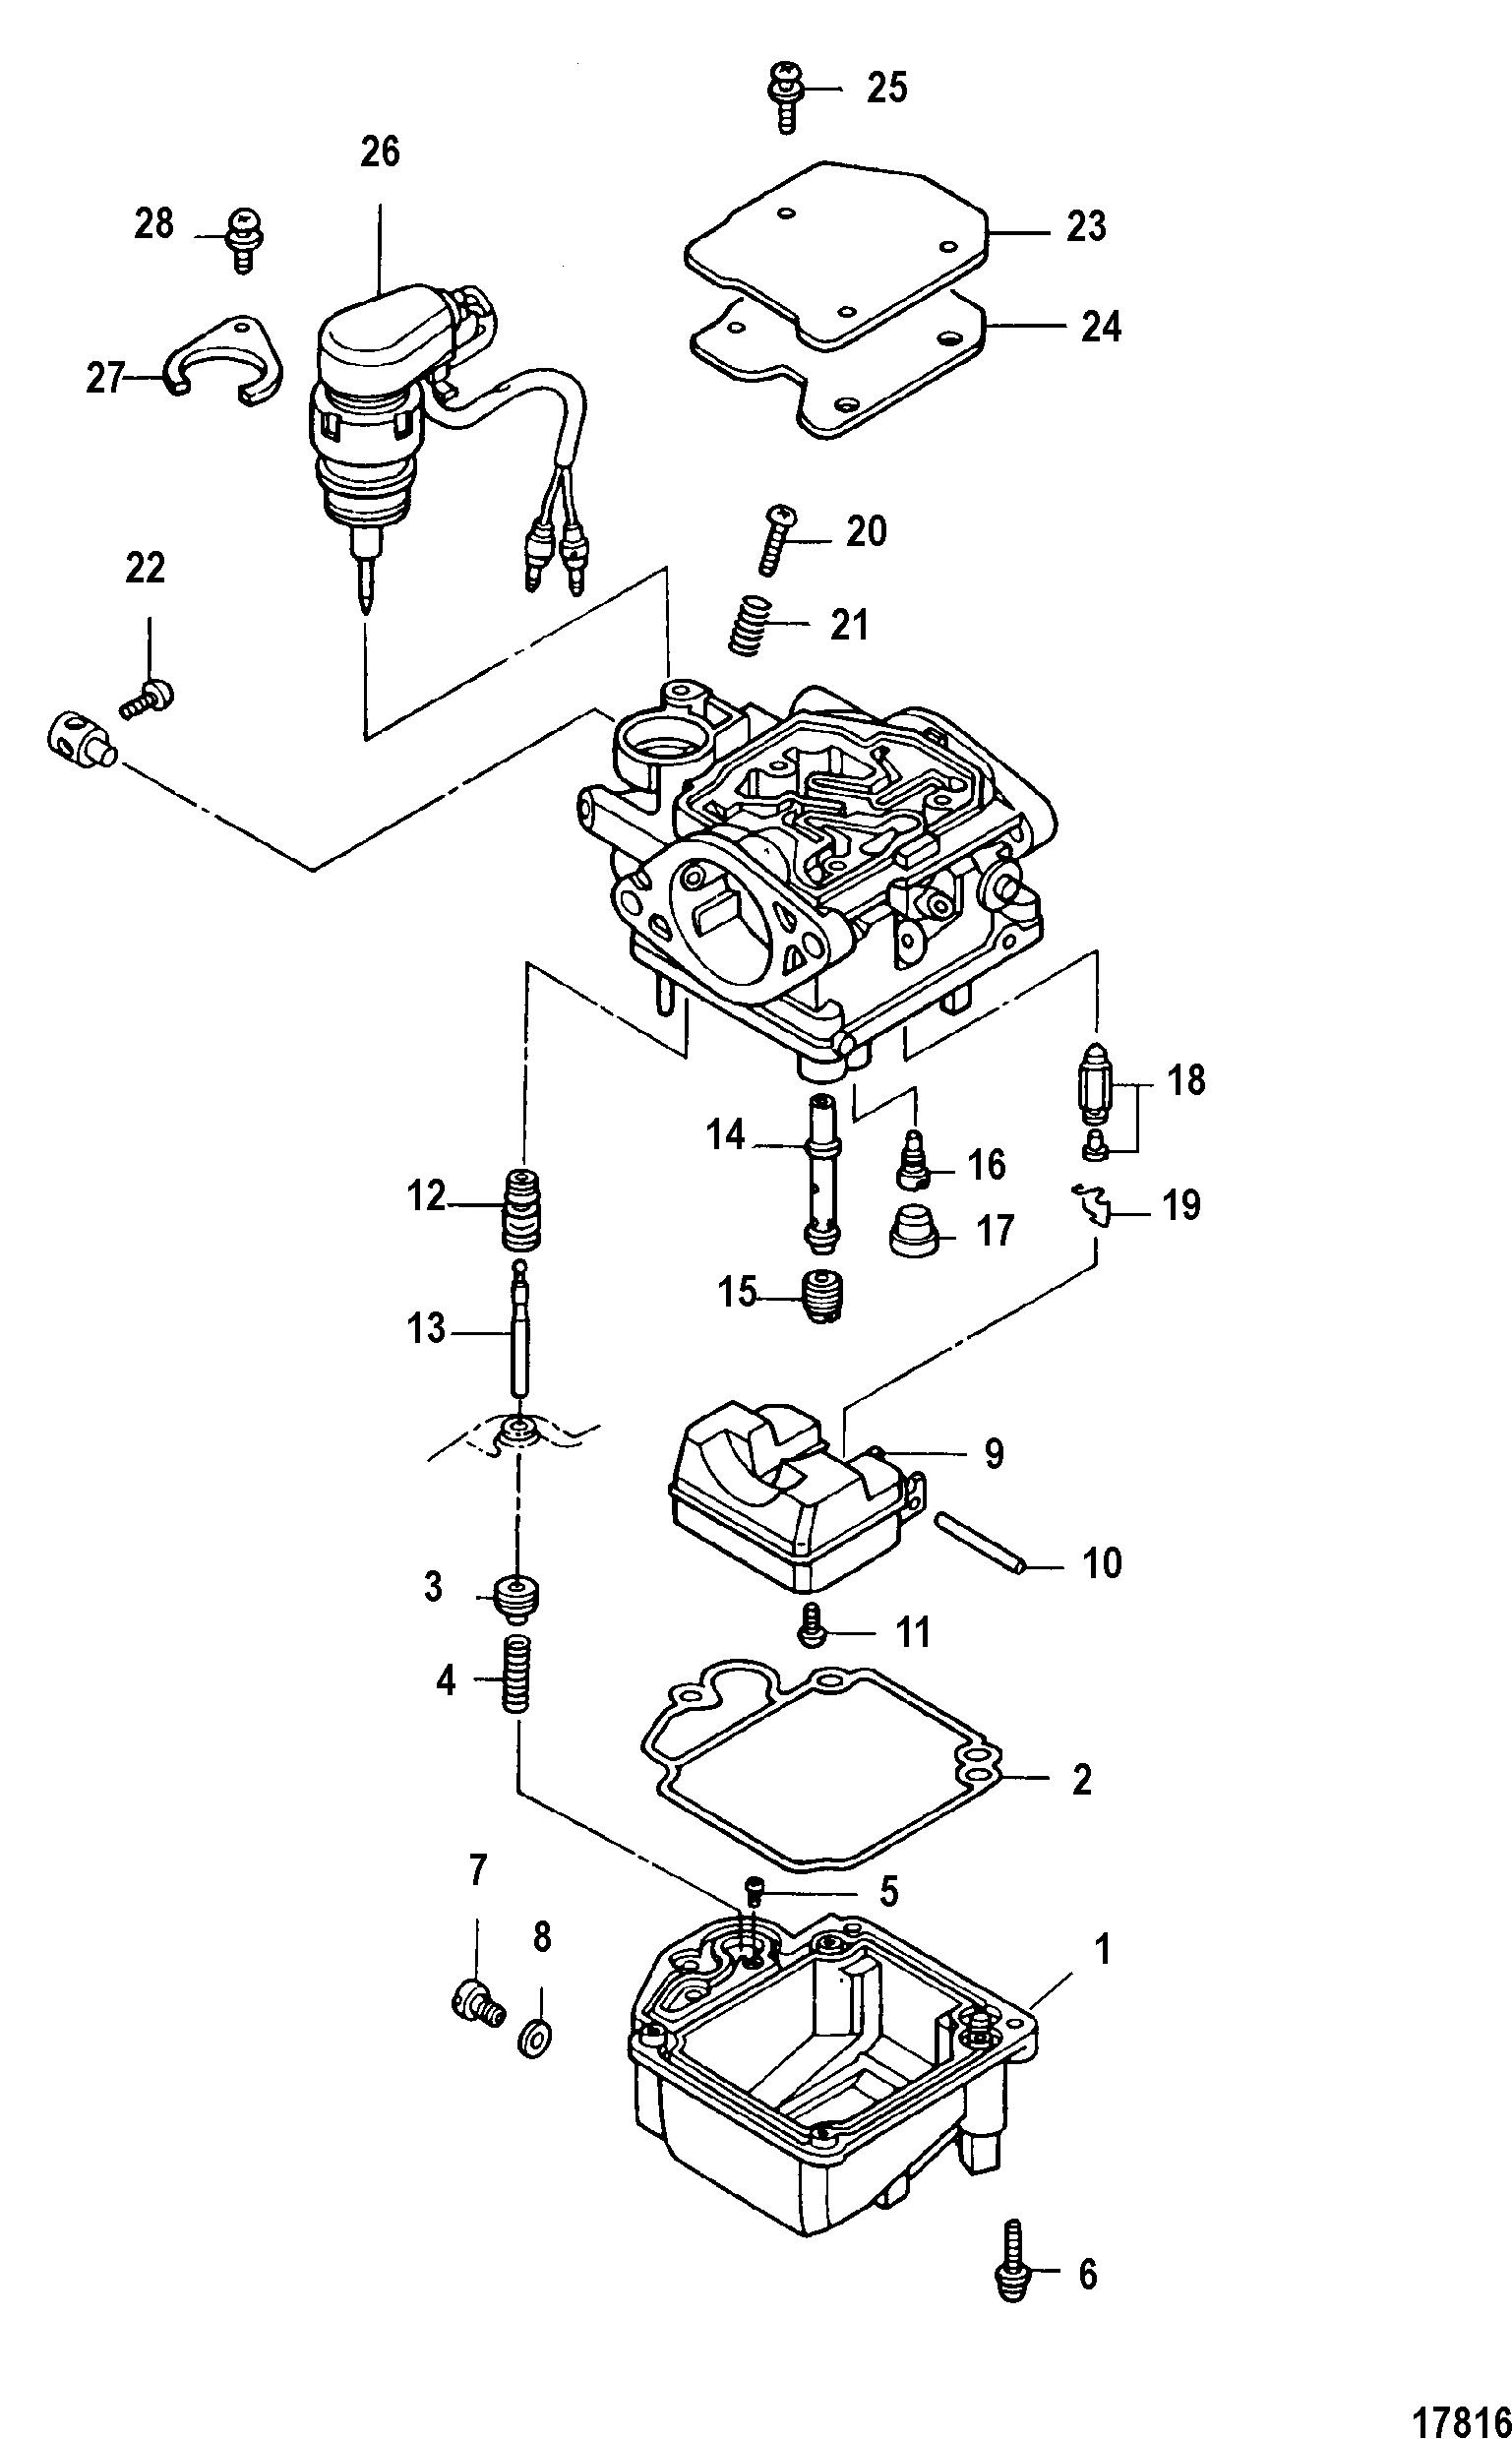 2 cycle engine carburetor diagram apollo space suit parts free image for